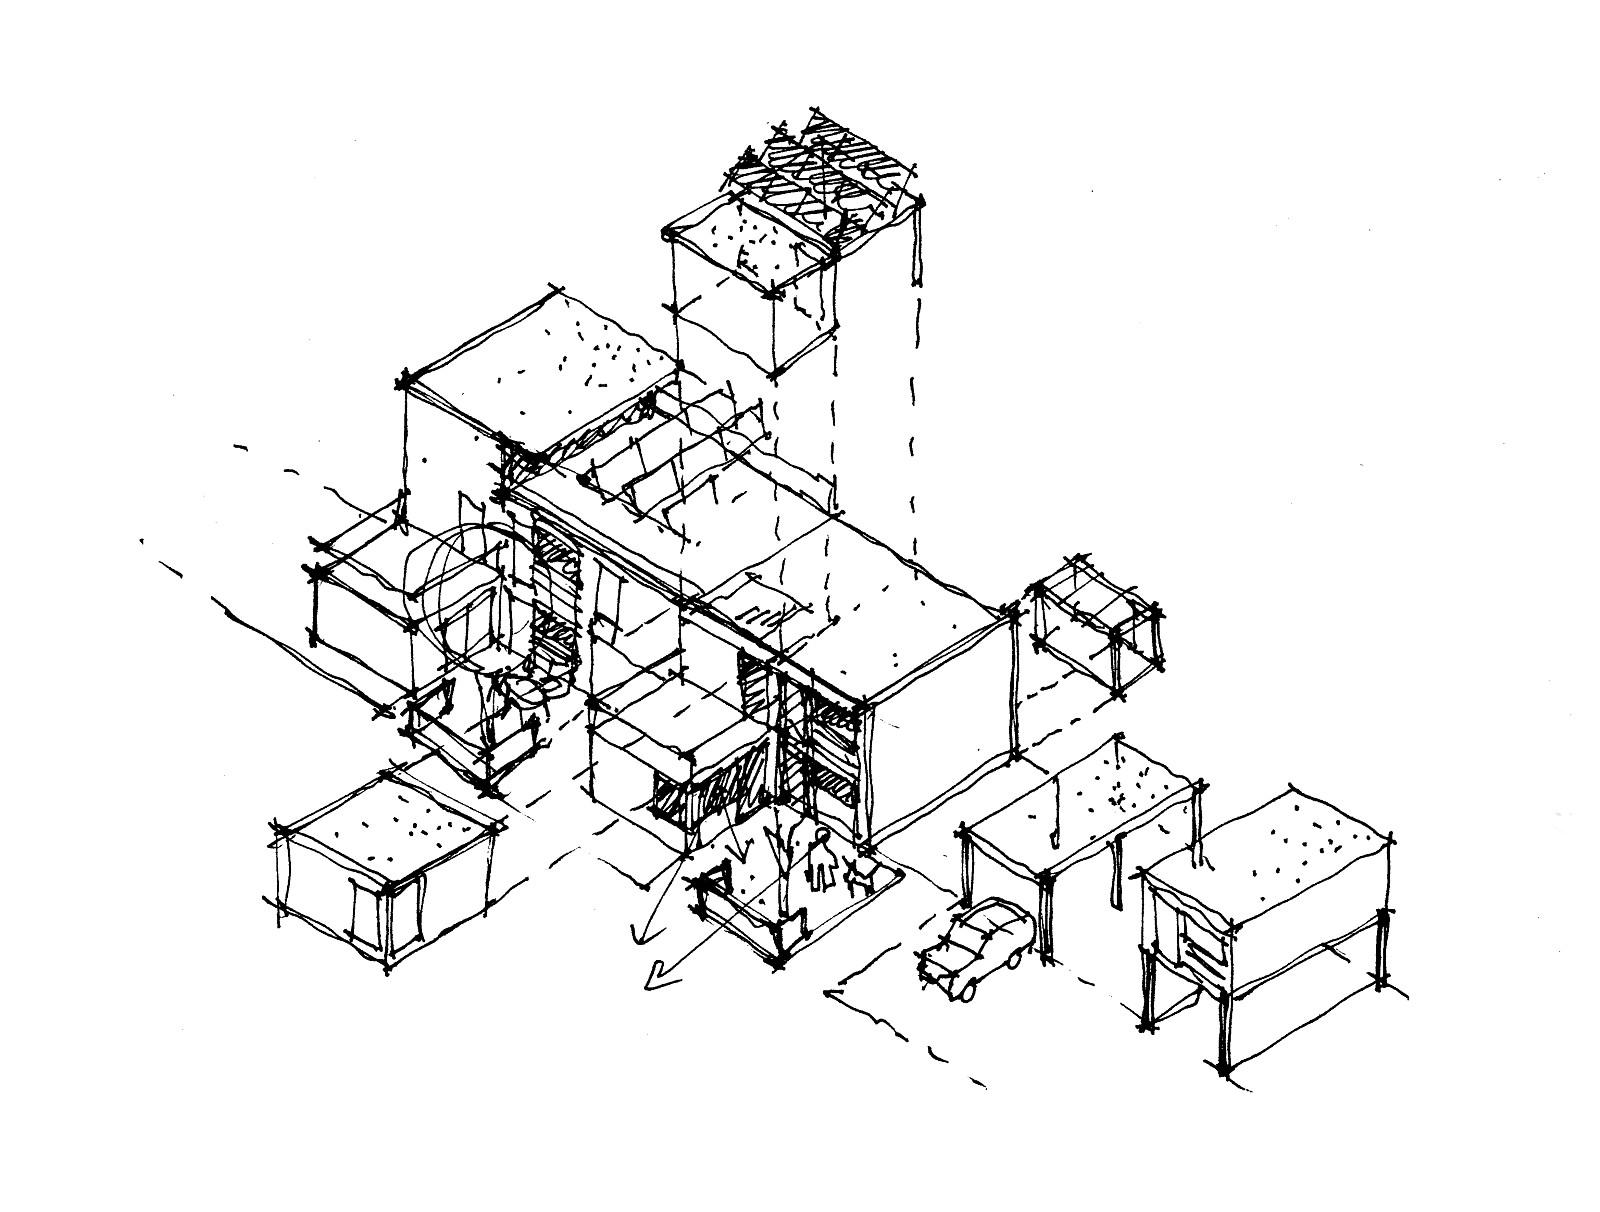 Modulare Photovoltaik und Anbauten, Ulm 2000